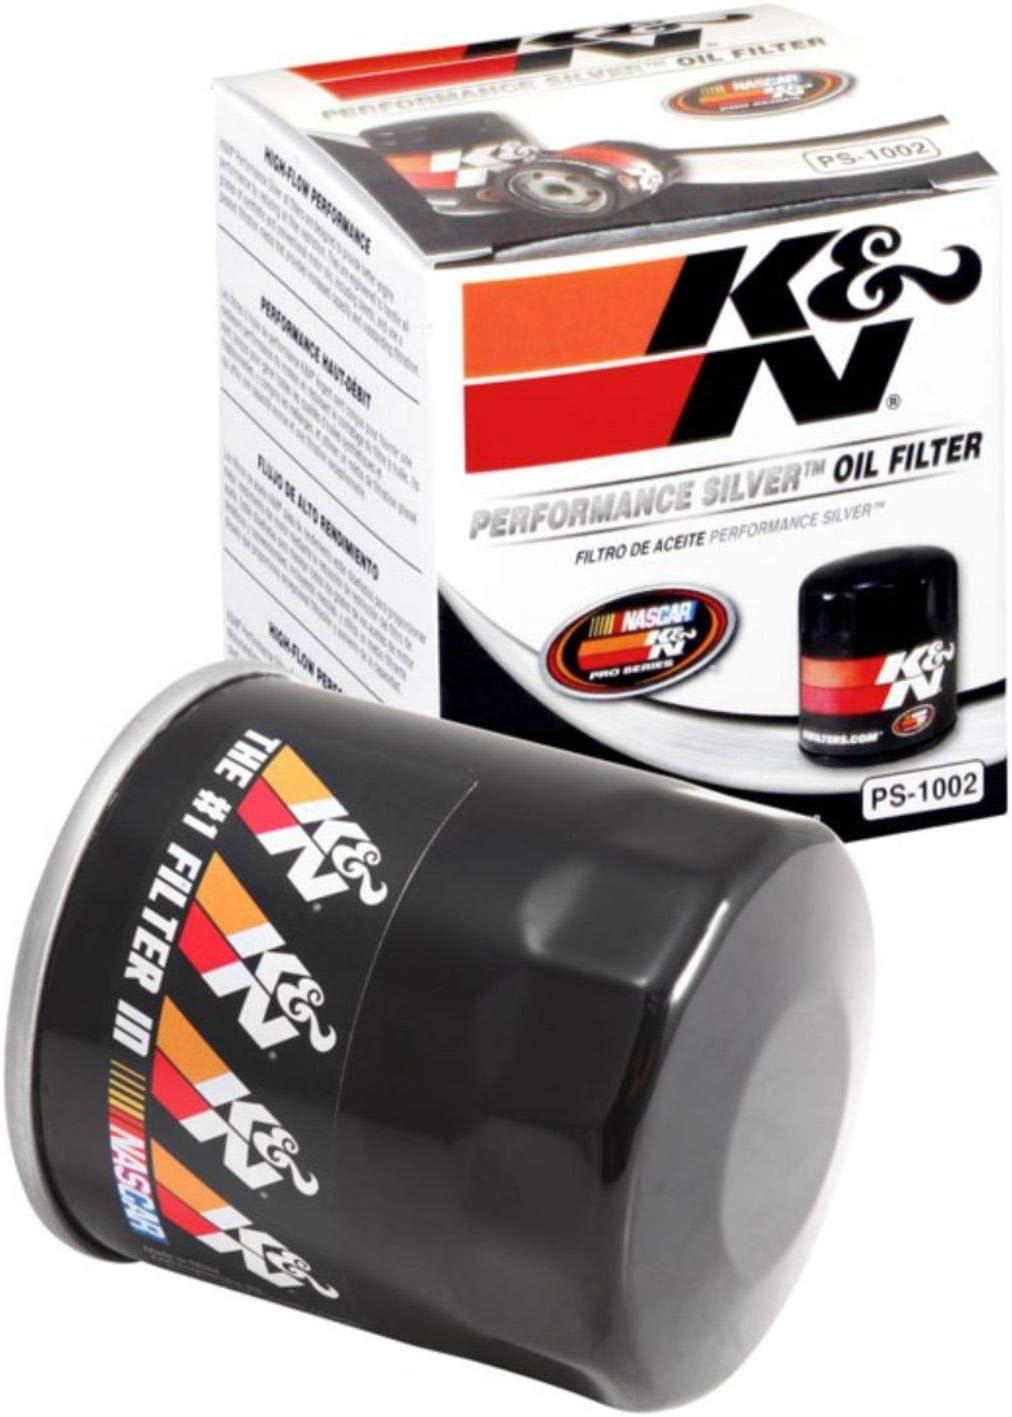 K N Ps 1002 Kfz Ölfilter Auto